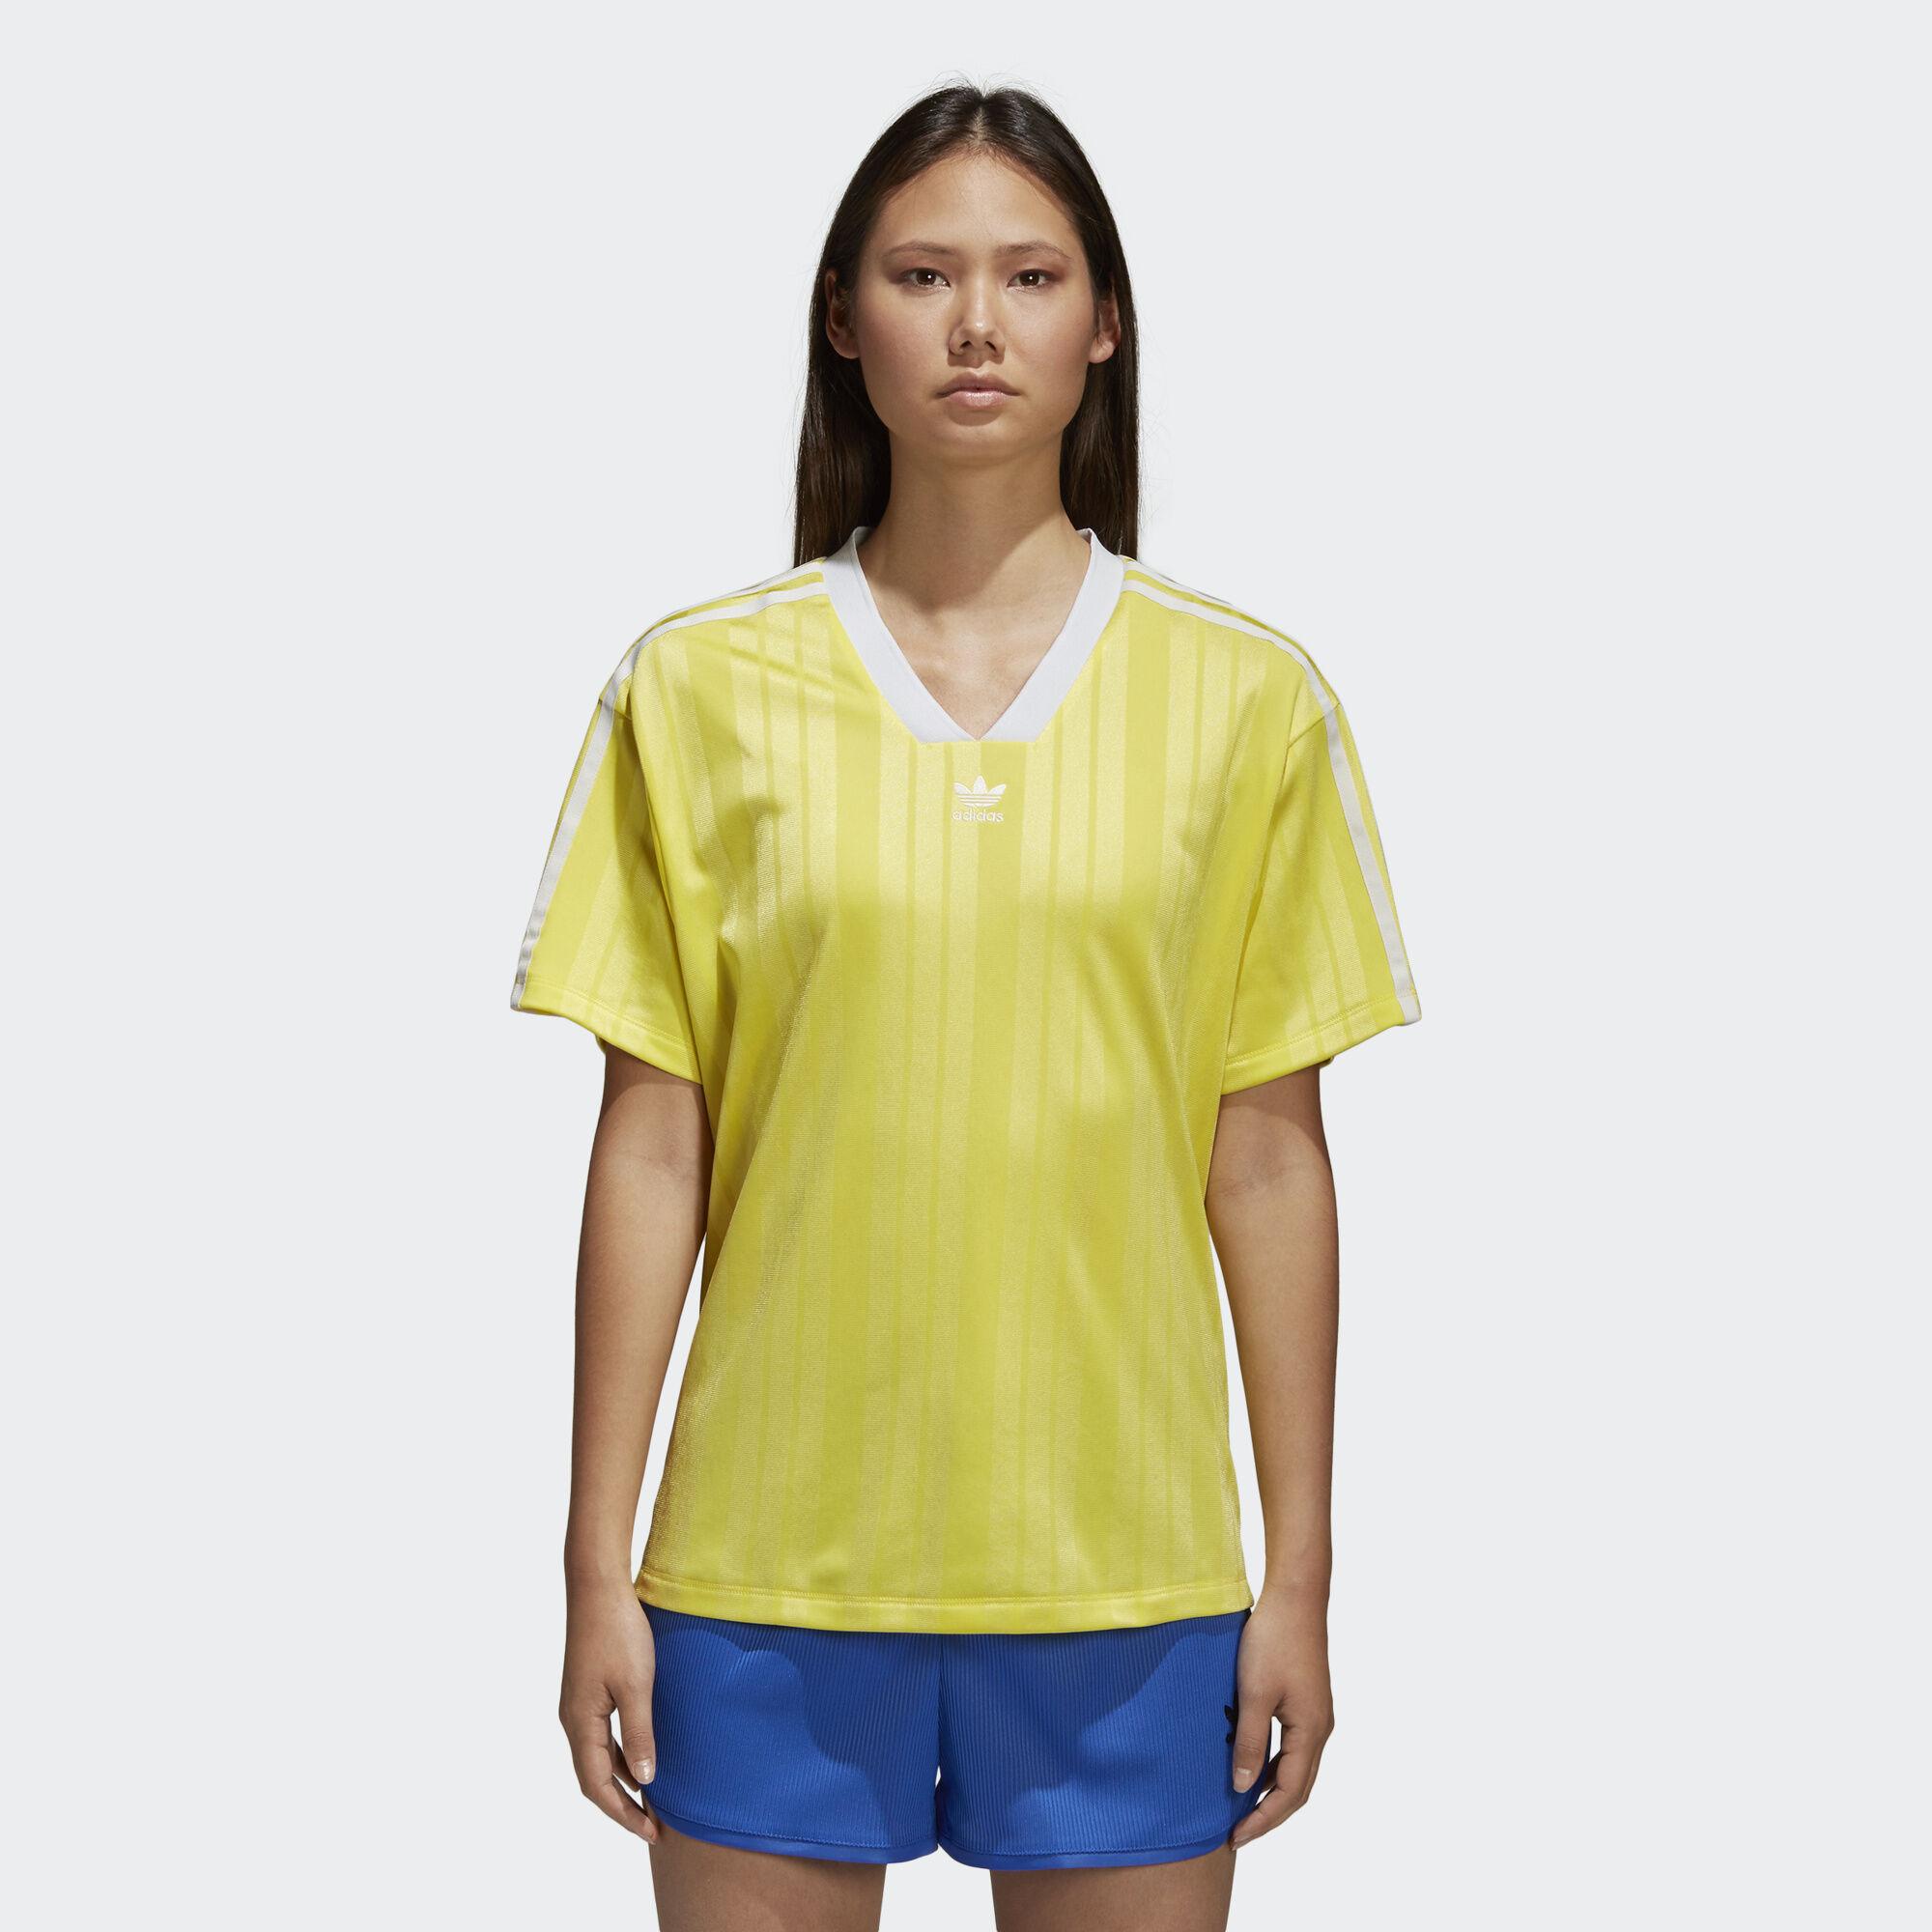 adidas - Fashion League Tee Prime Yellow CE5504. Women Originals ac240bd58ae8b